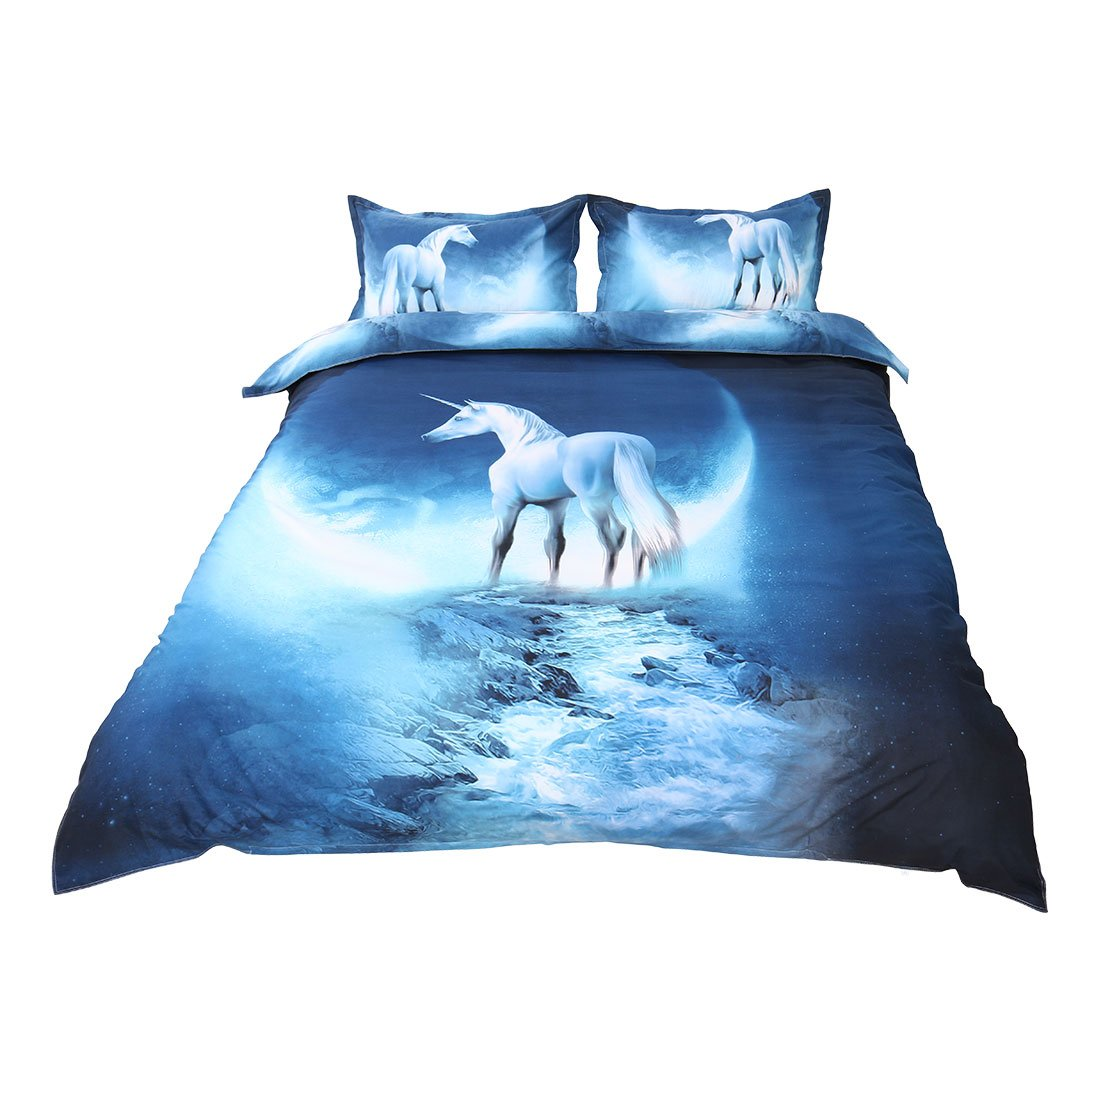 uxcell 3d Galaxy Mysterious Boundless Bedding Sets Duvet/Quilt Cover Set 3pcs Queen Size (White Horse)